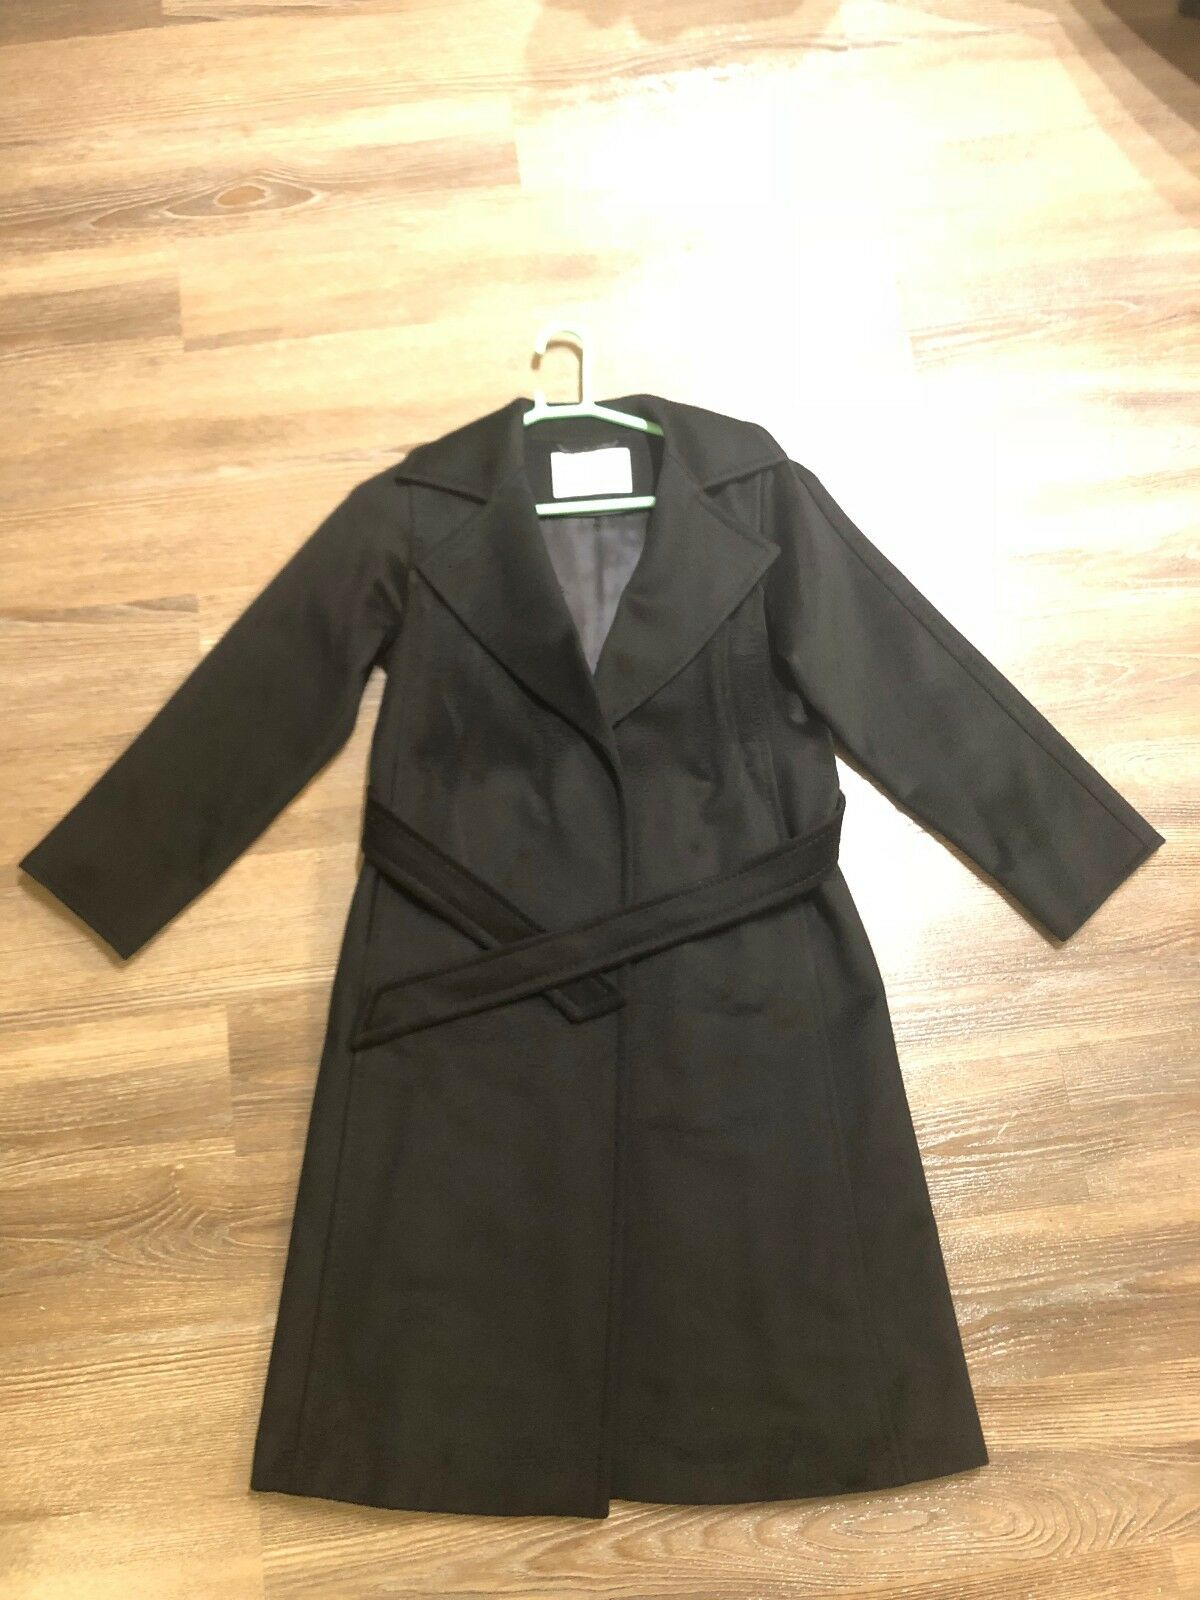 Max Mara 101801 Madame Belted Coat In Camel - US 0